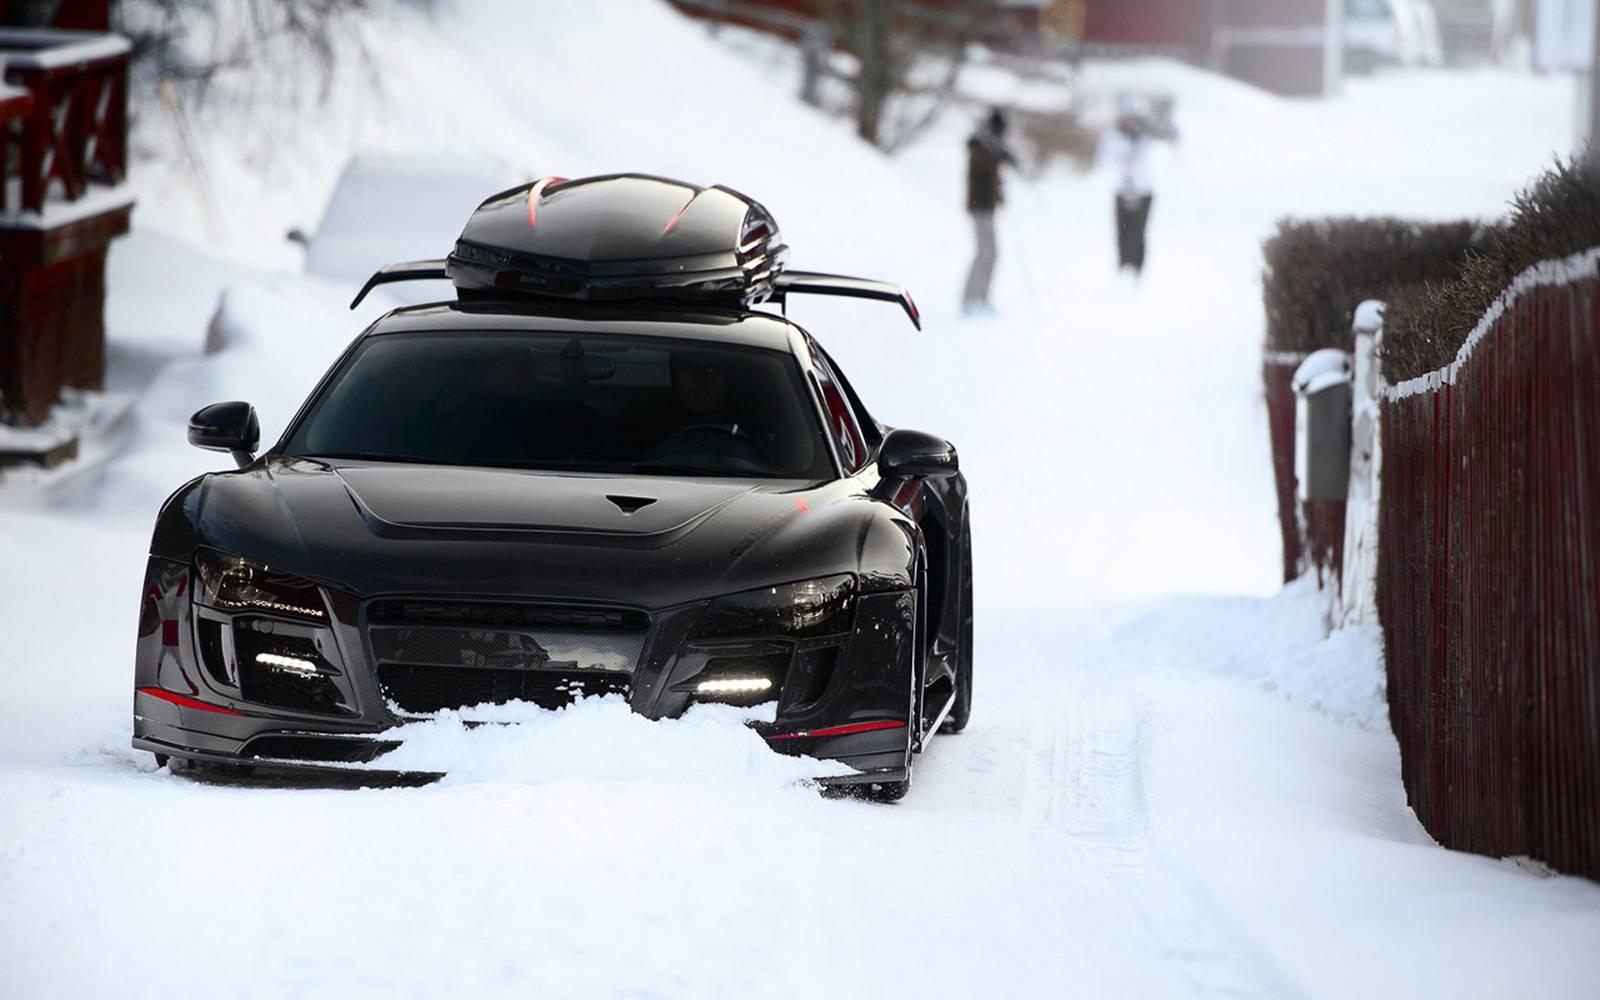 A Look at Jon Olsson's Various Ski-Box Equipped Supercars ...